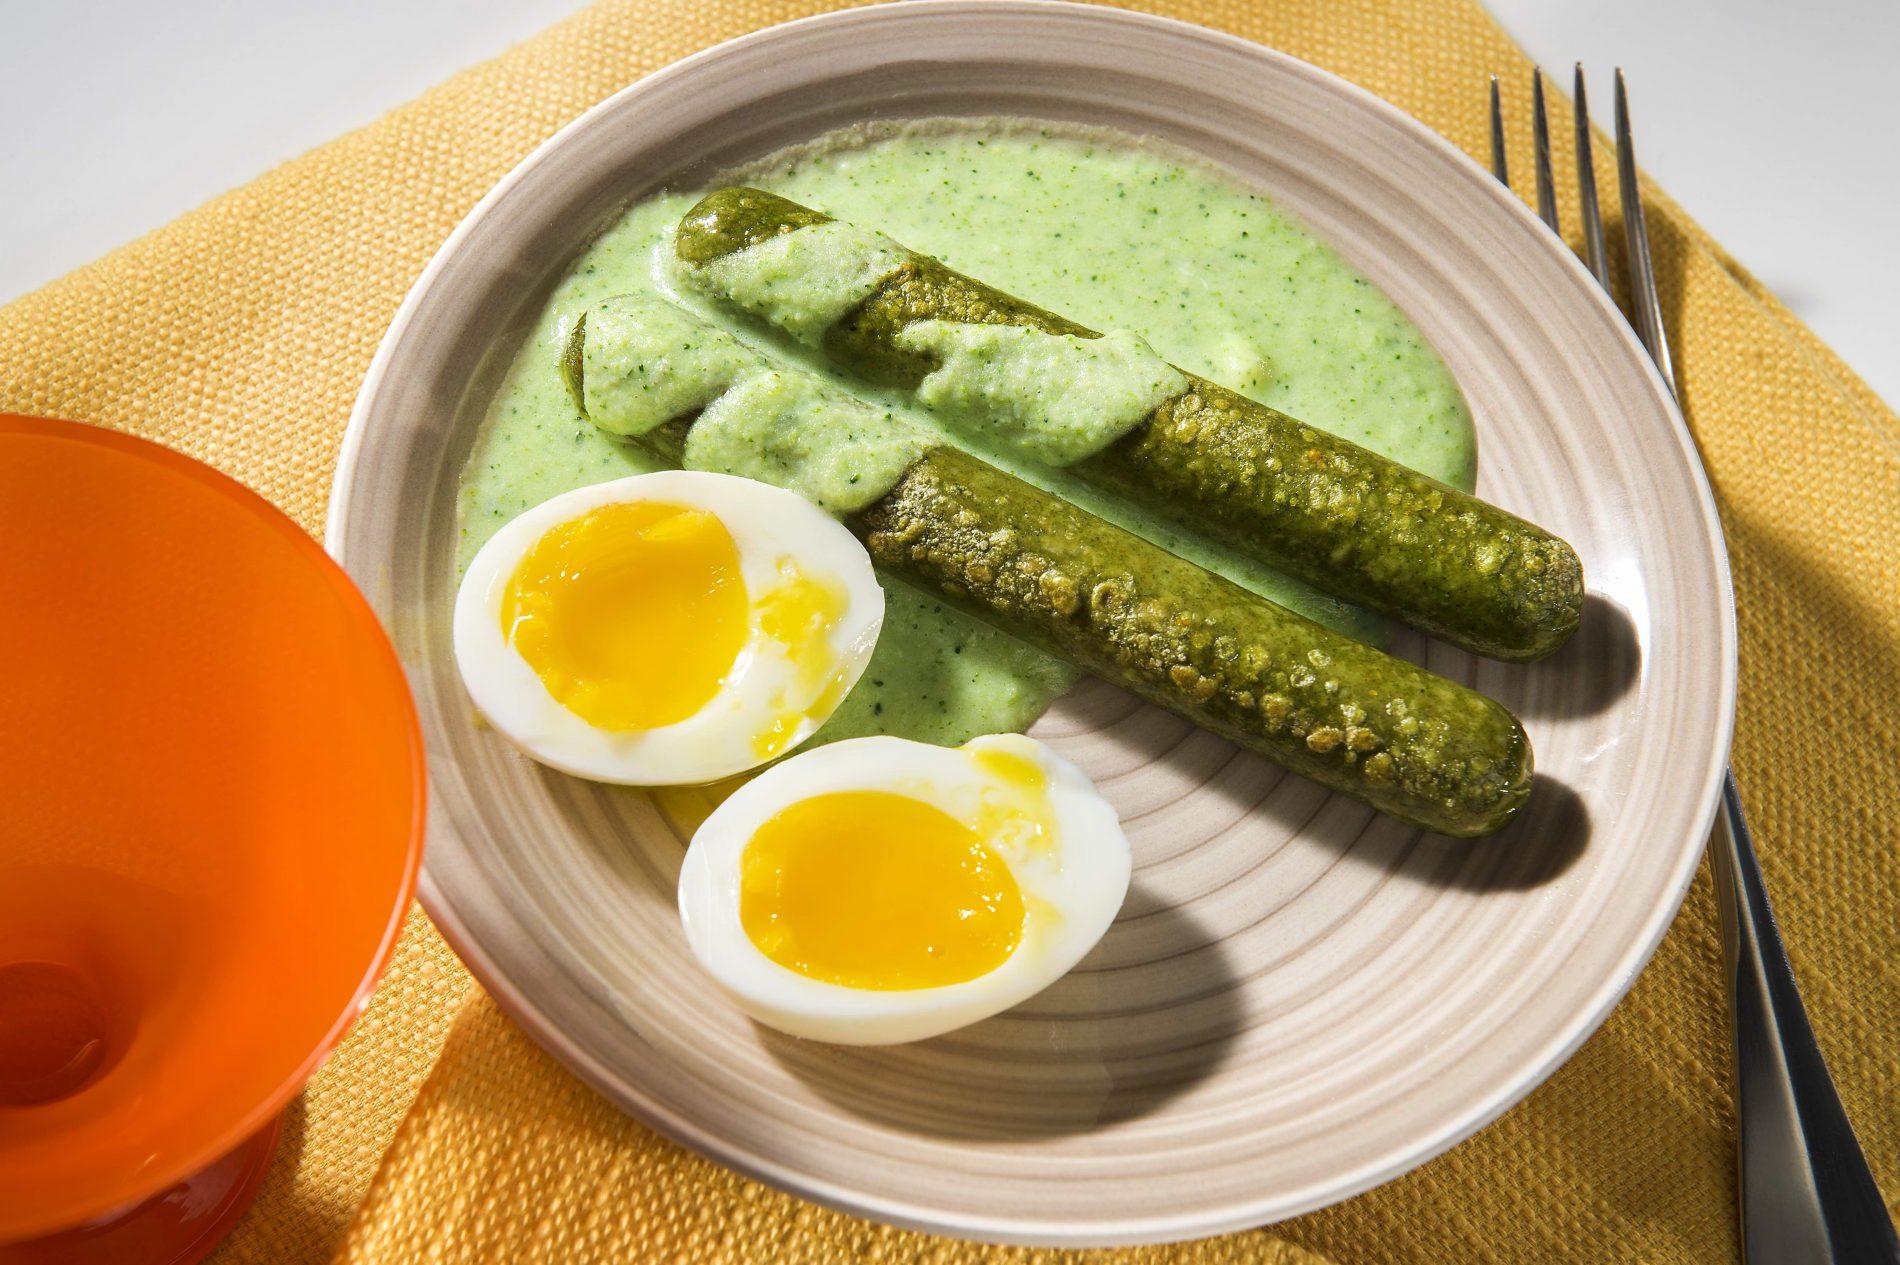 Ospiti vegetariani a cena: ricetta con wurstel di verdure